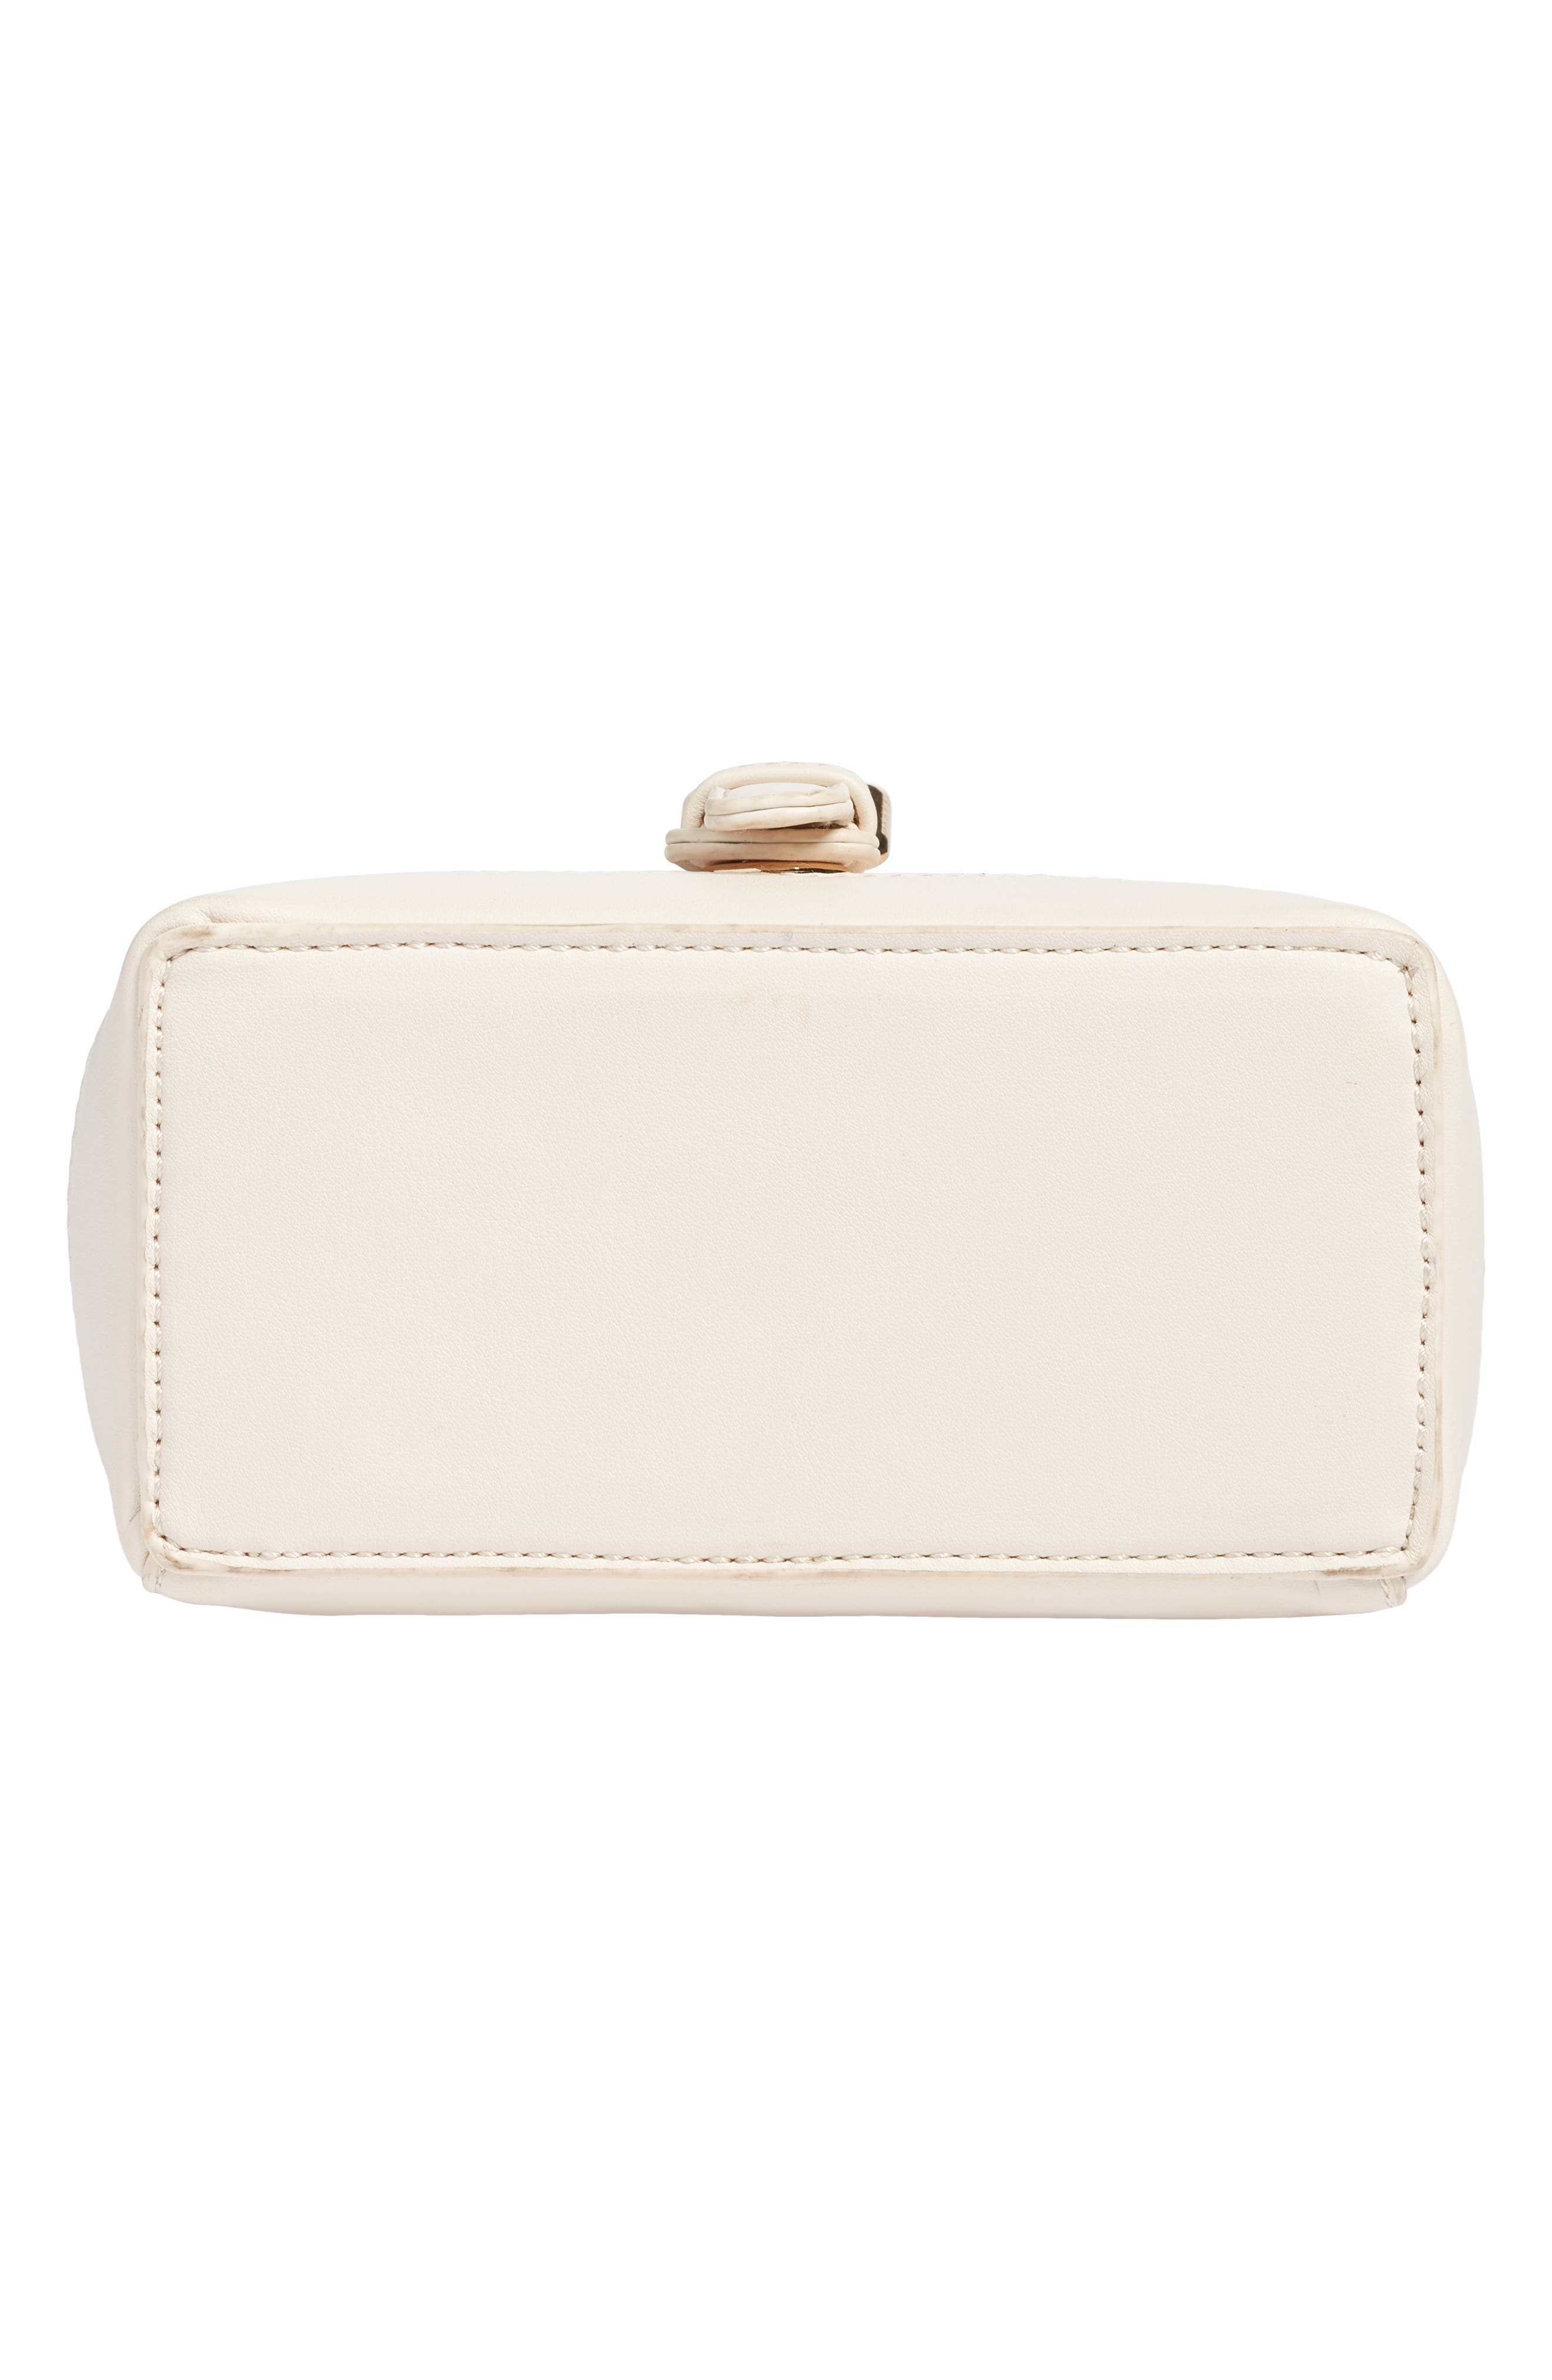 Top Handle Studded Bag,                             Alternate thumbnail 5, color,                             WHITE